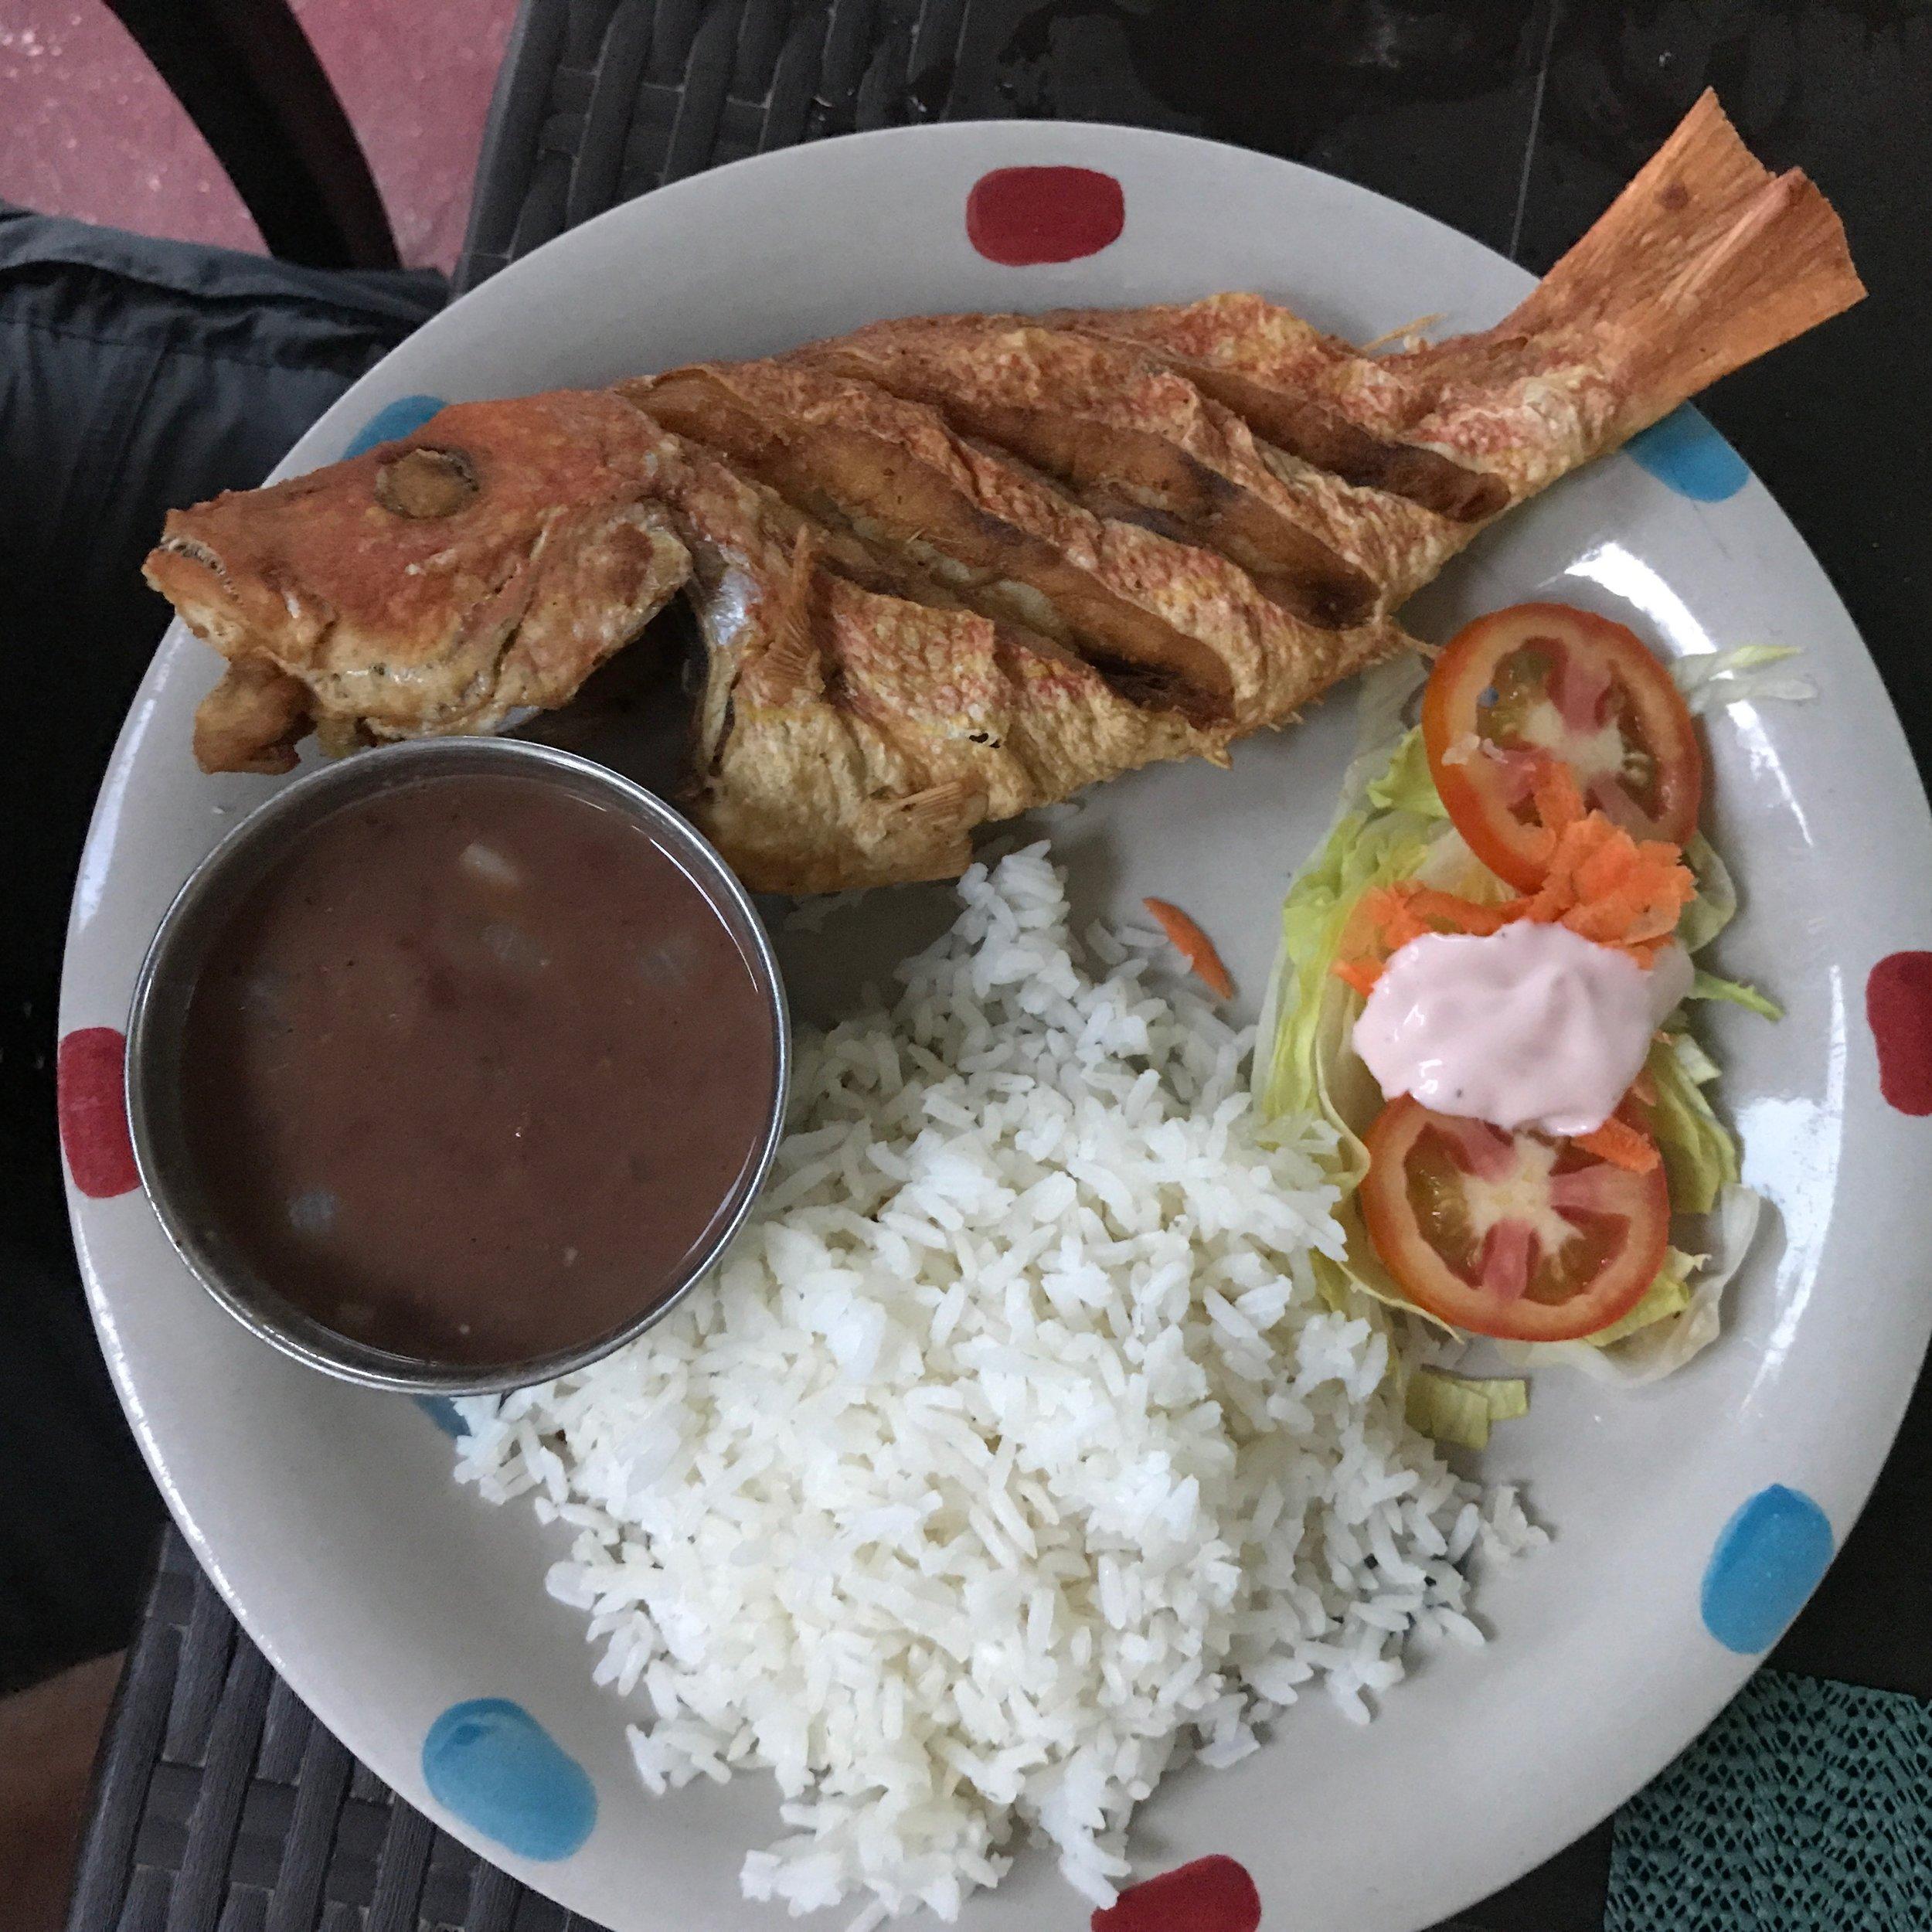 Aaron's fish dinner